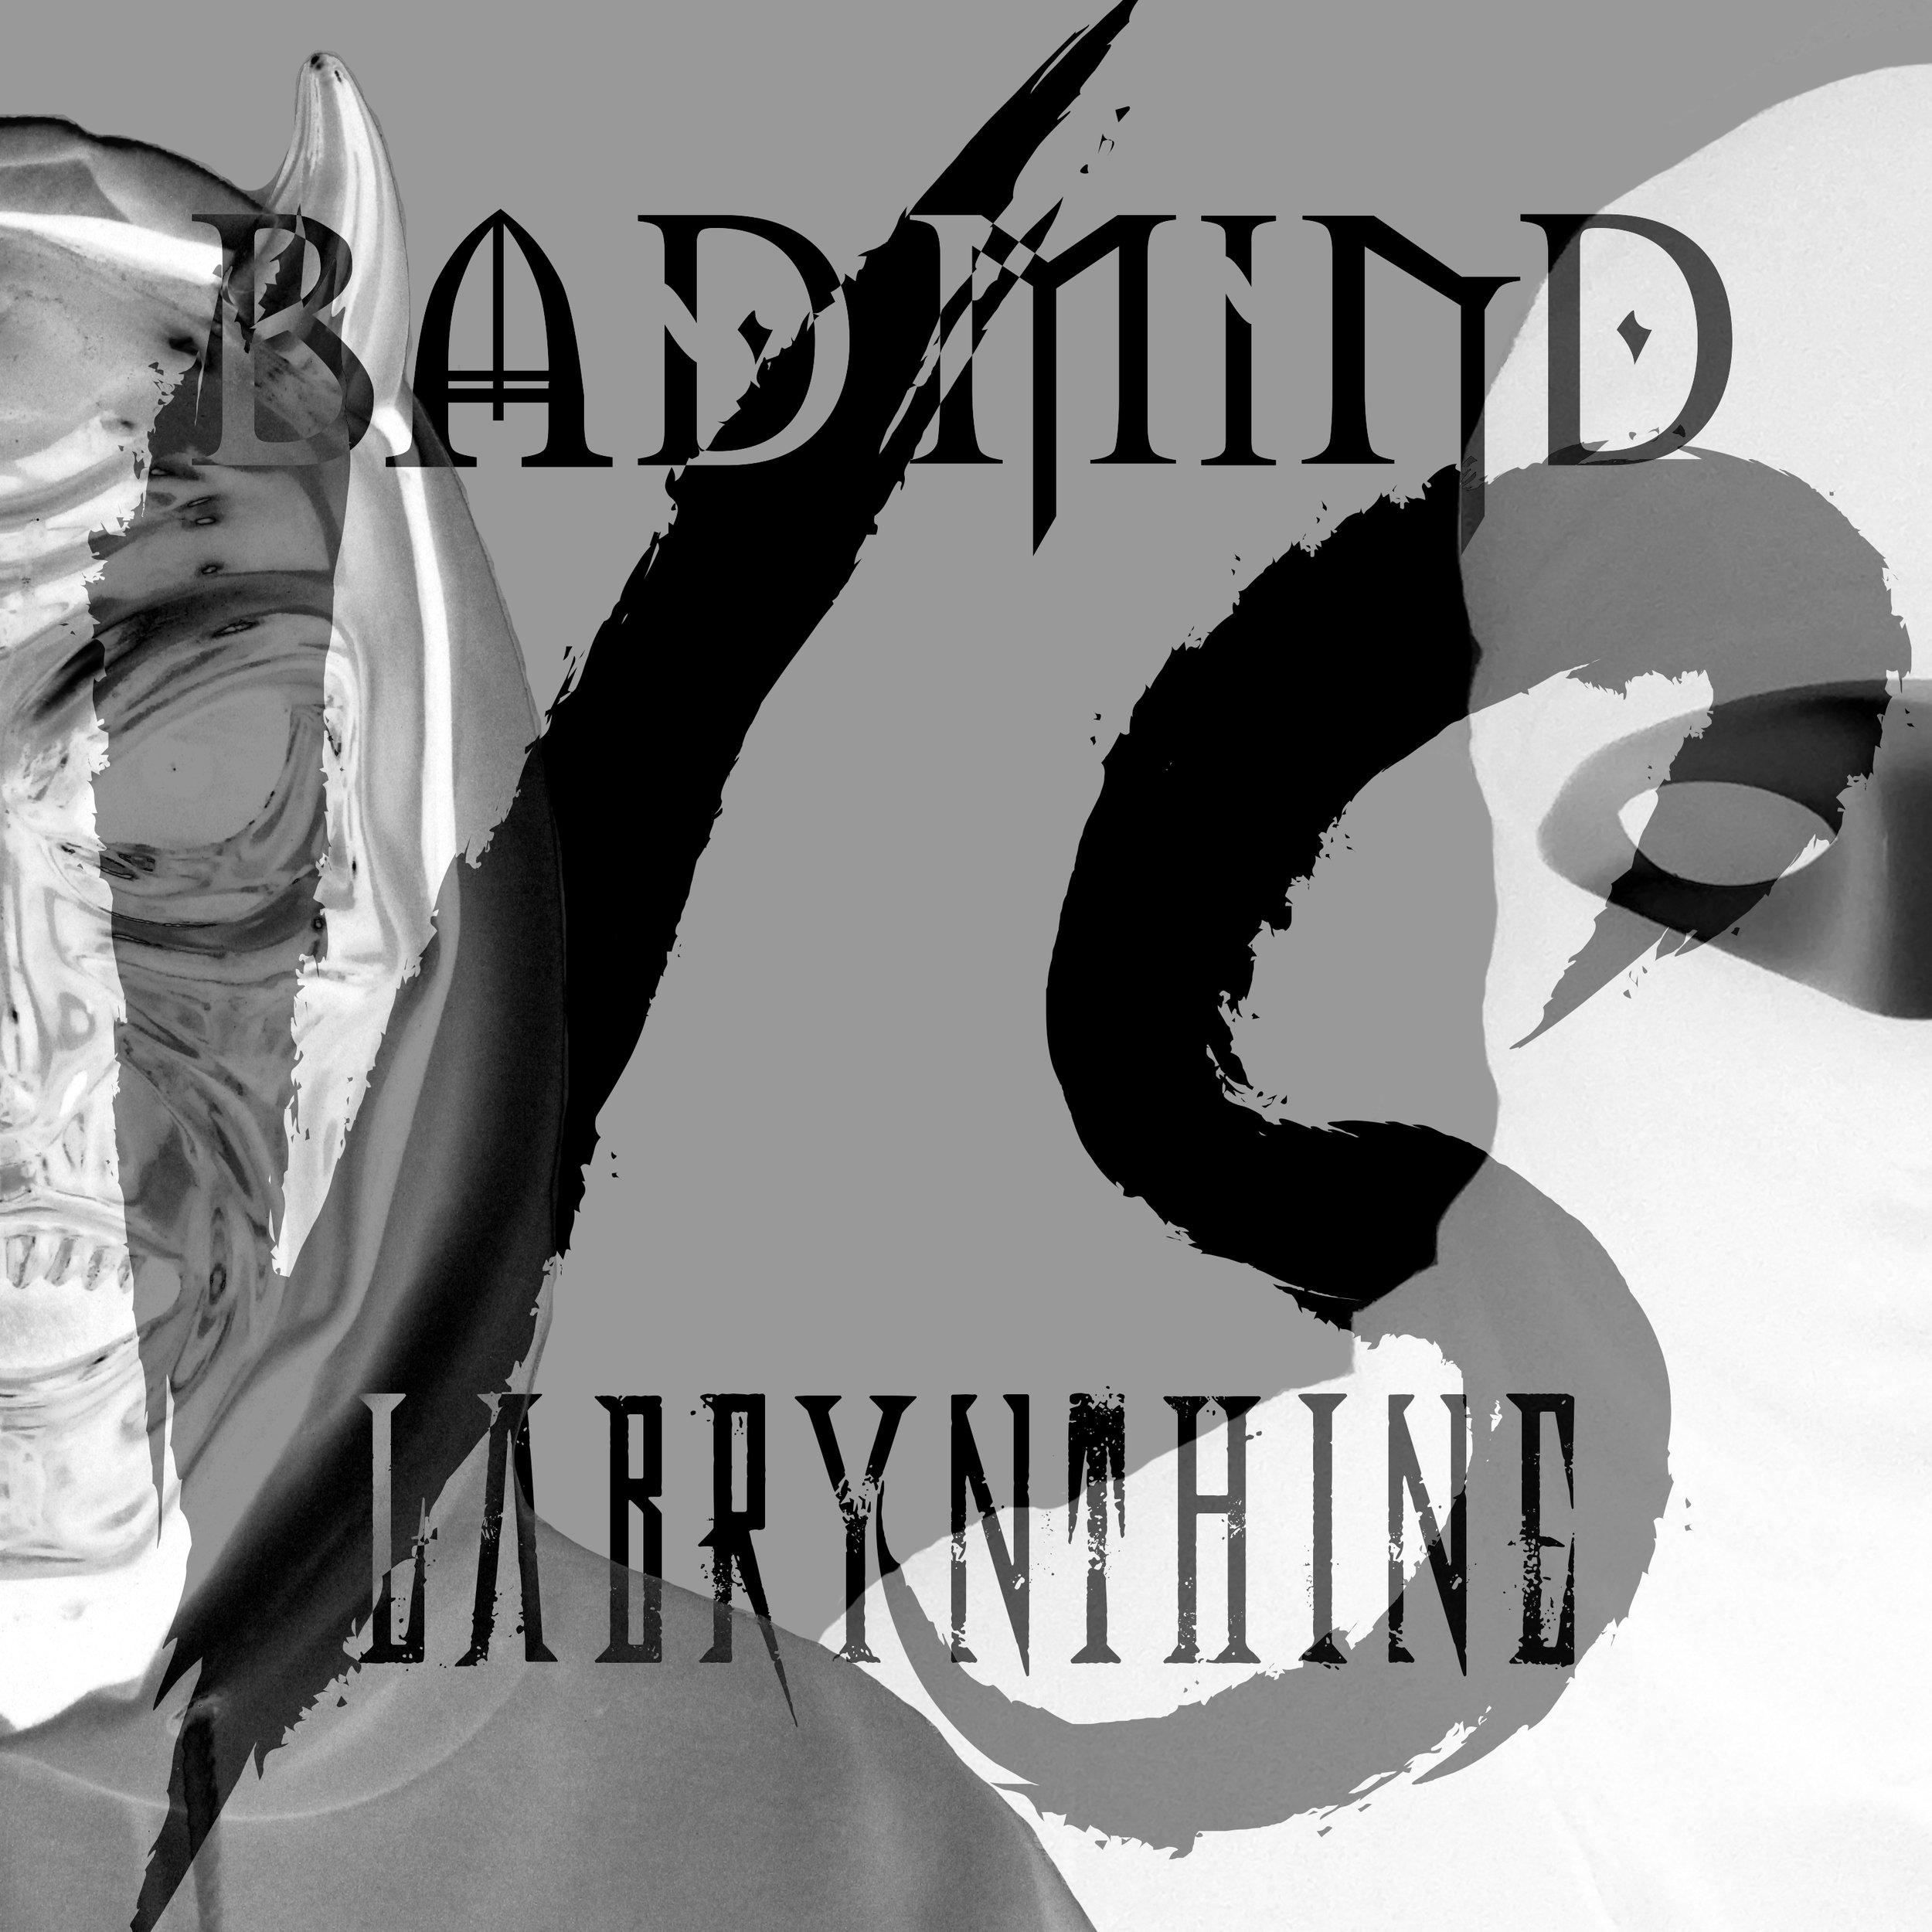 Bad Mind VS Labrynthine